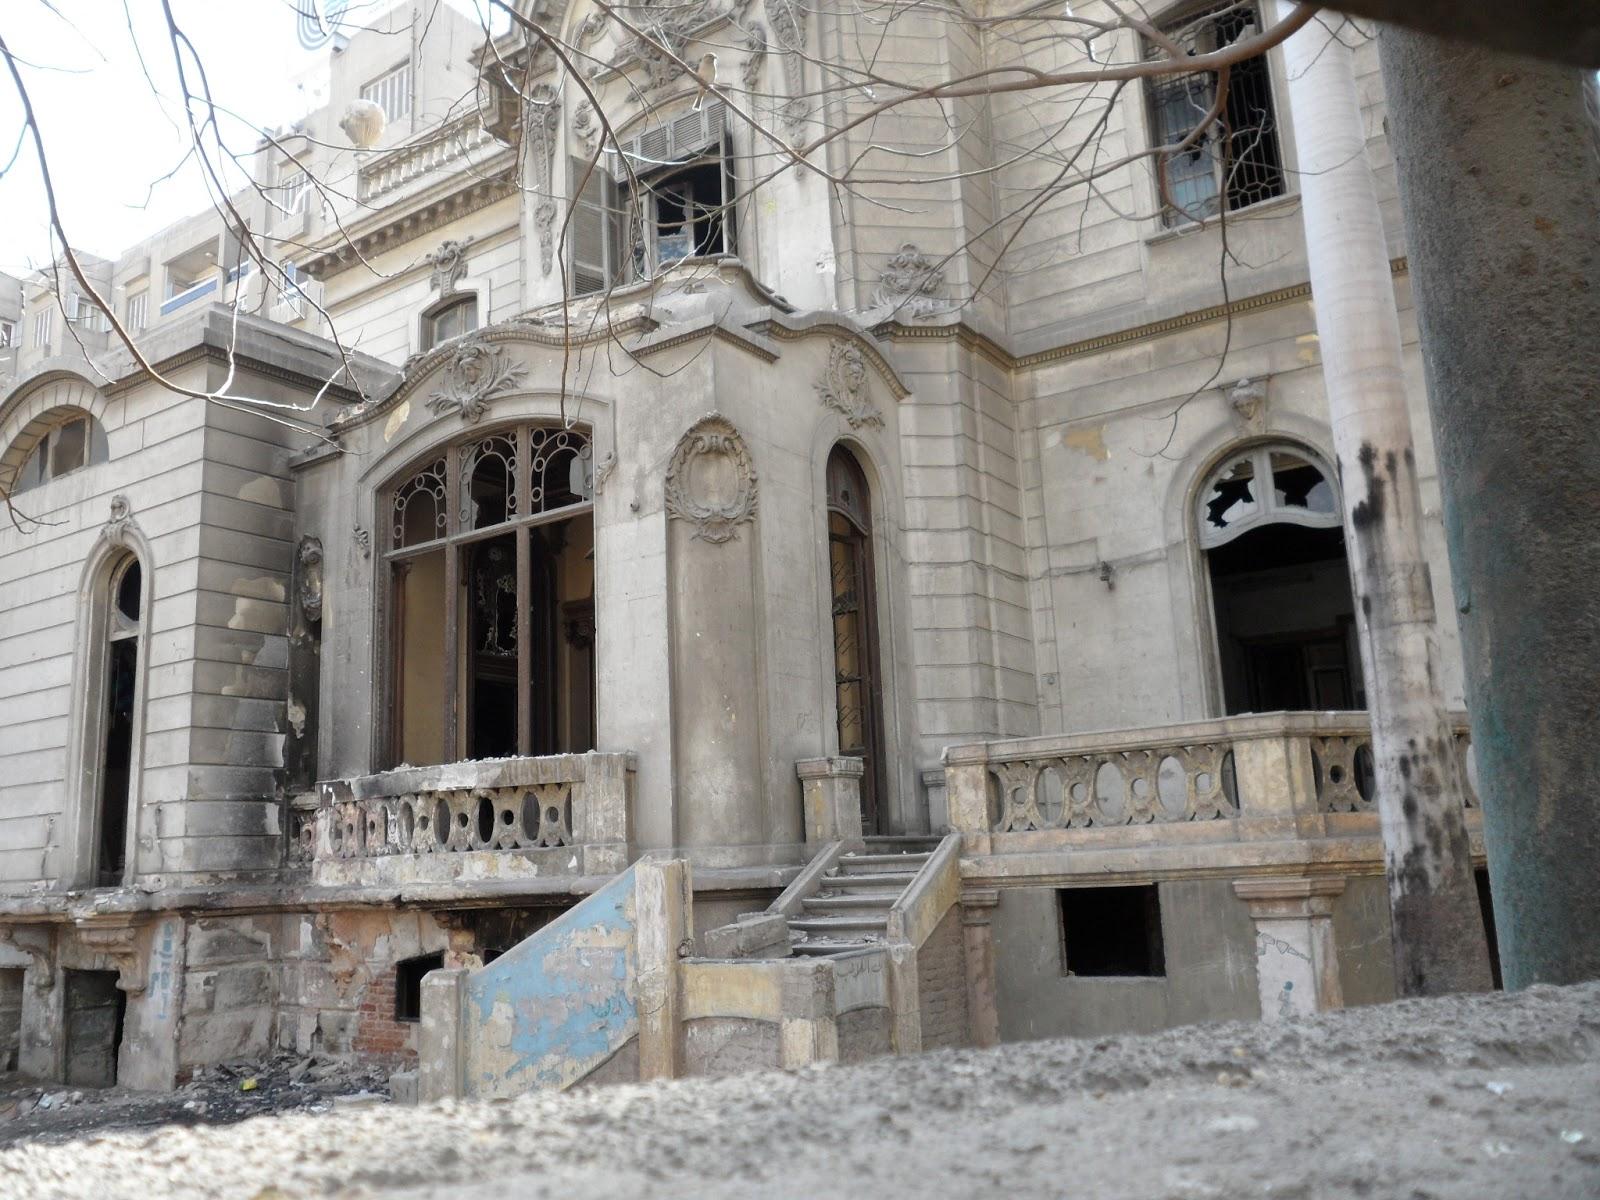 Dr Joris Kila Reports On Feb 1 Fire That Damaged The